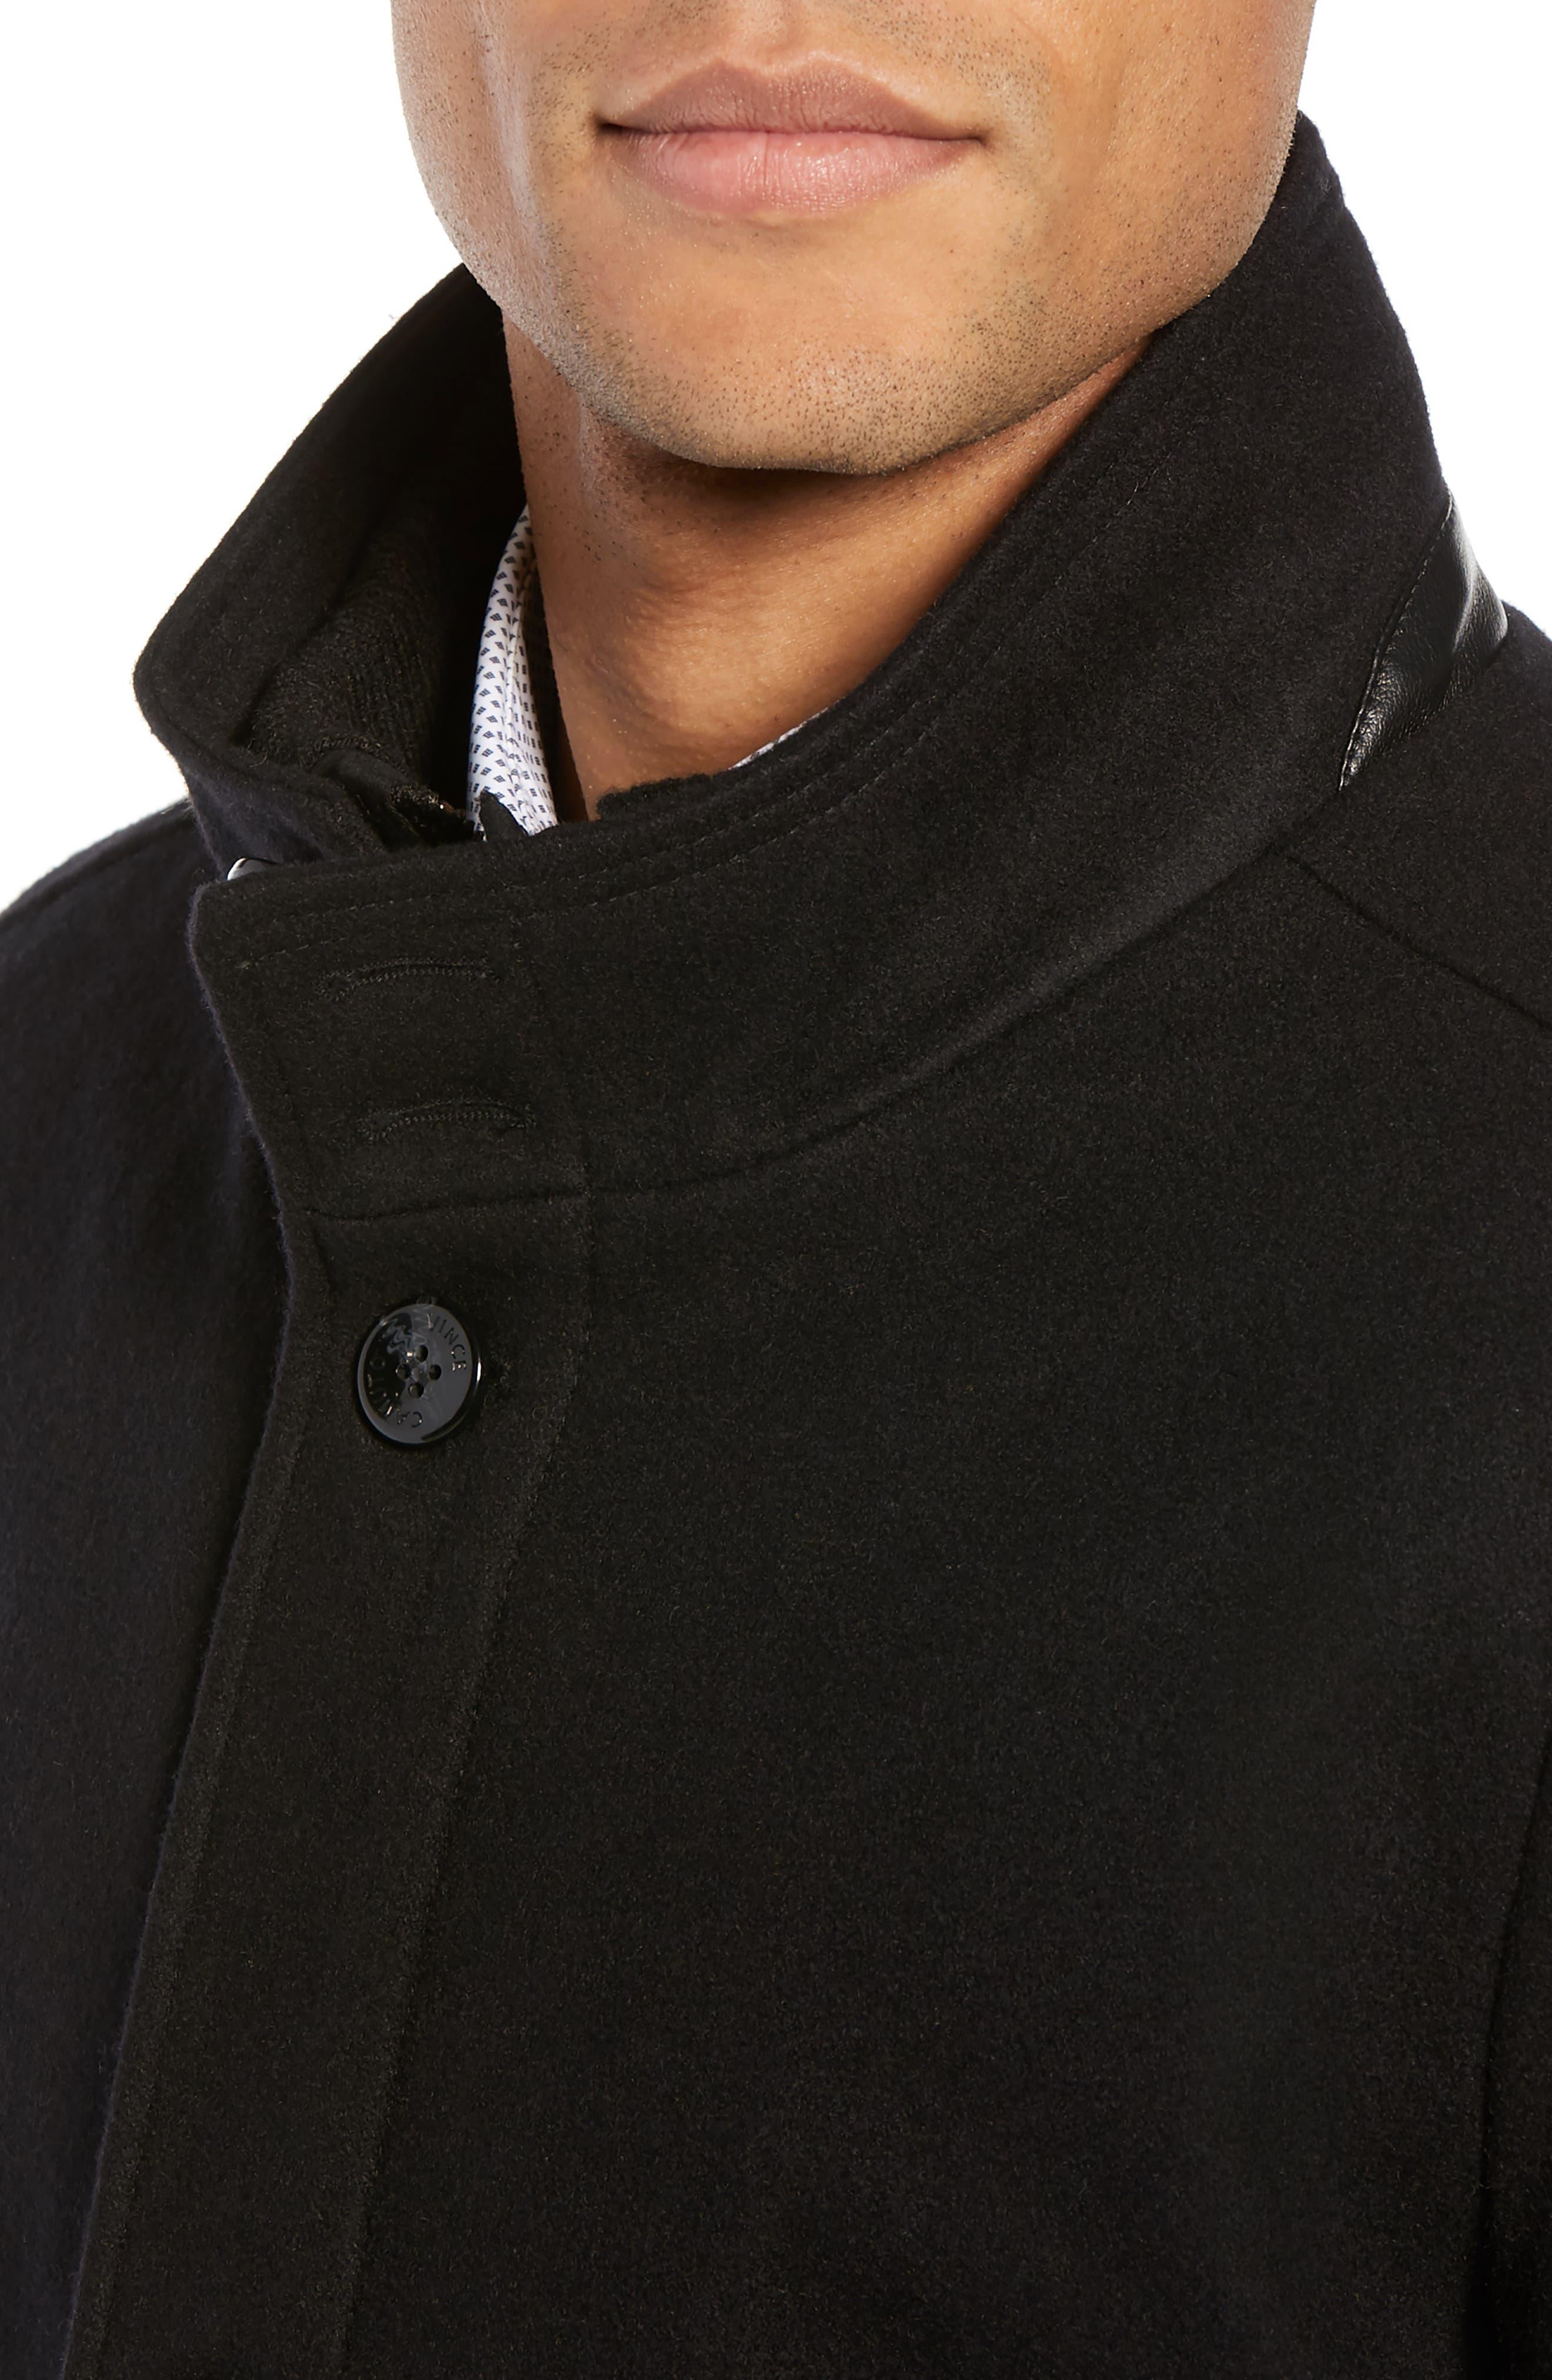 Classic Wool Blend Car Coat with Inset Bib,                             Alternate thumbnail 4, color,                             BLACK